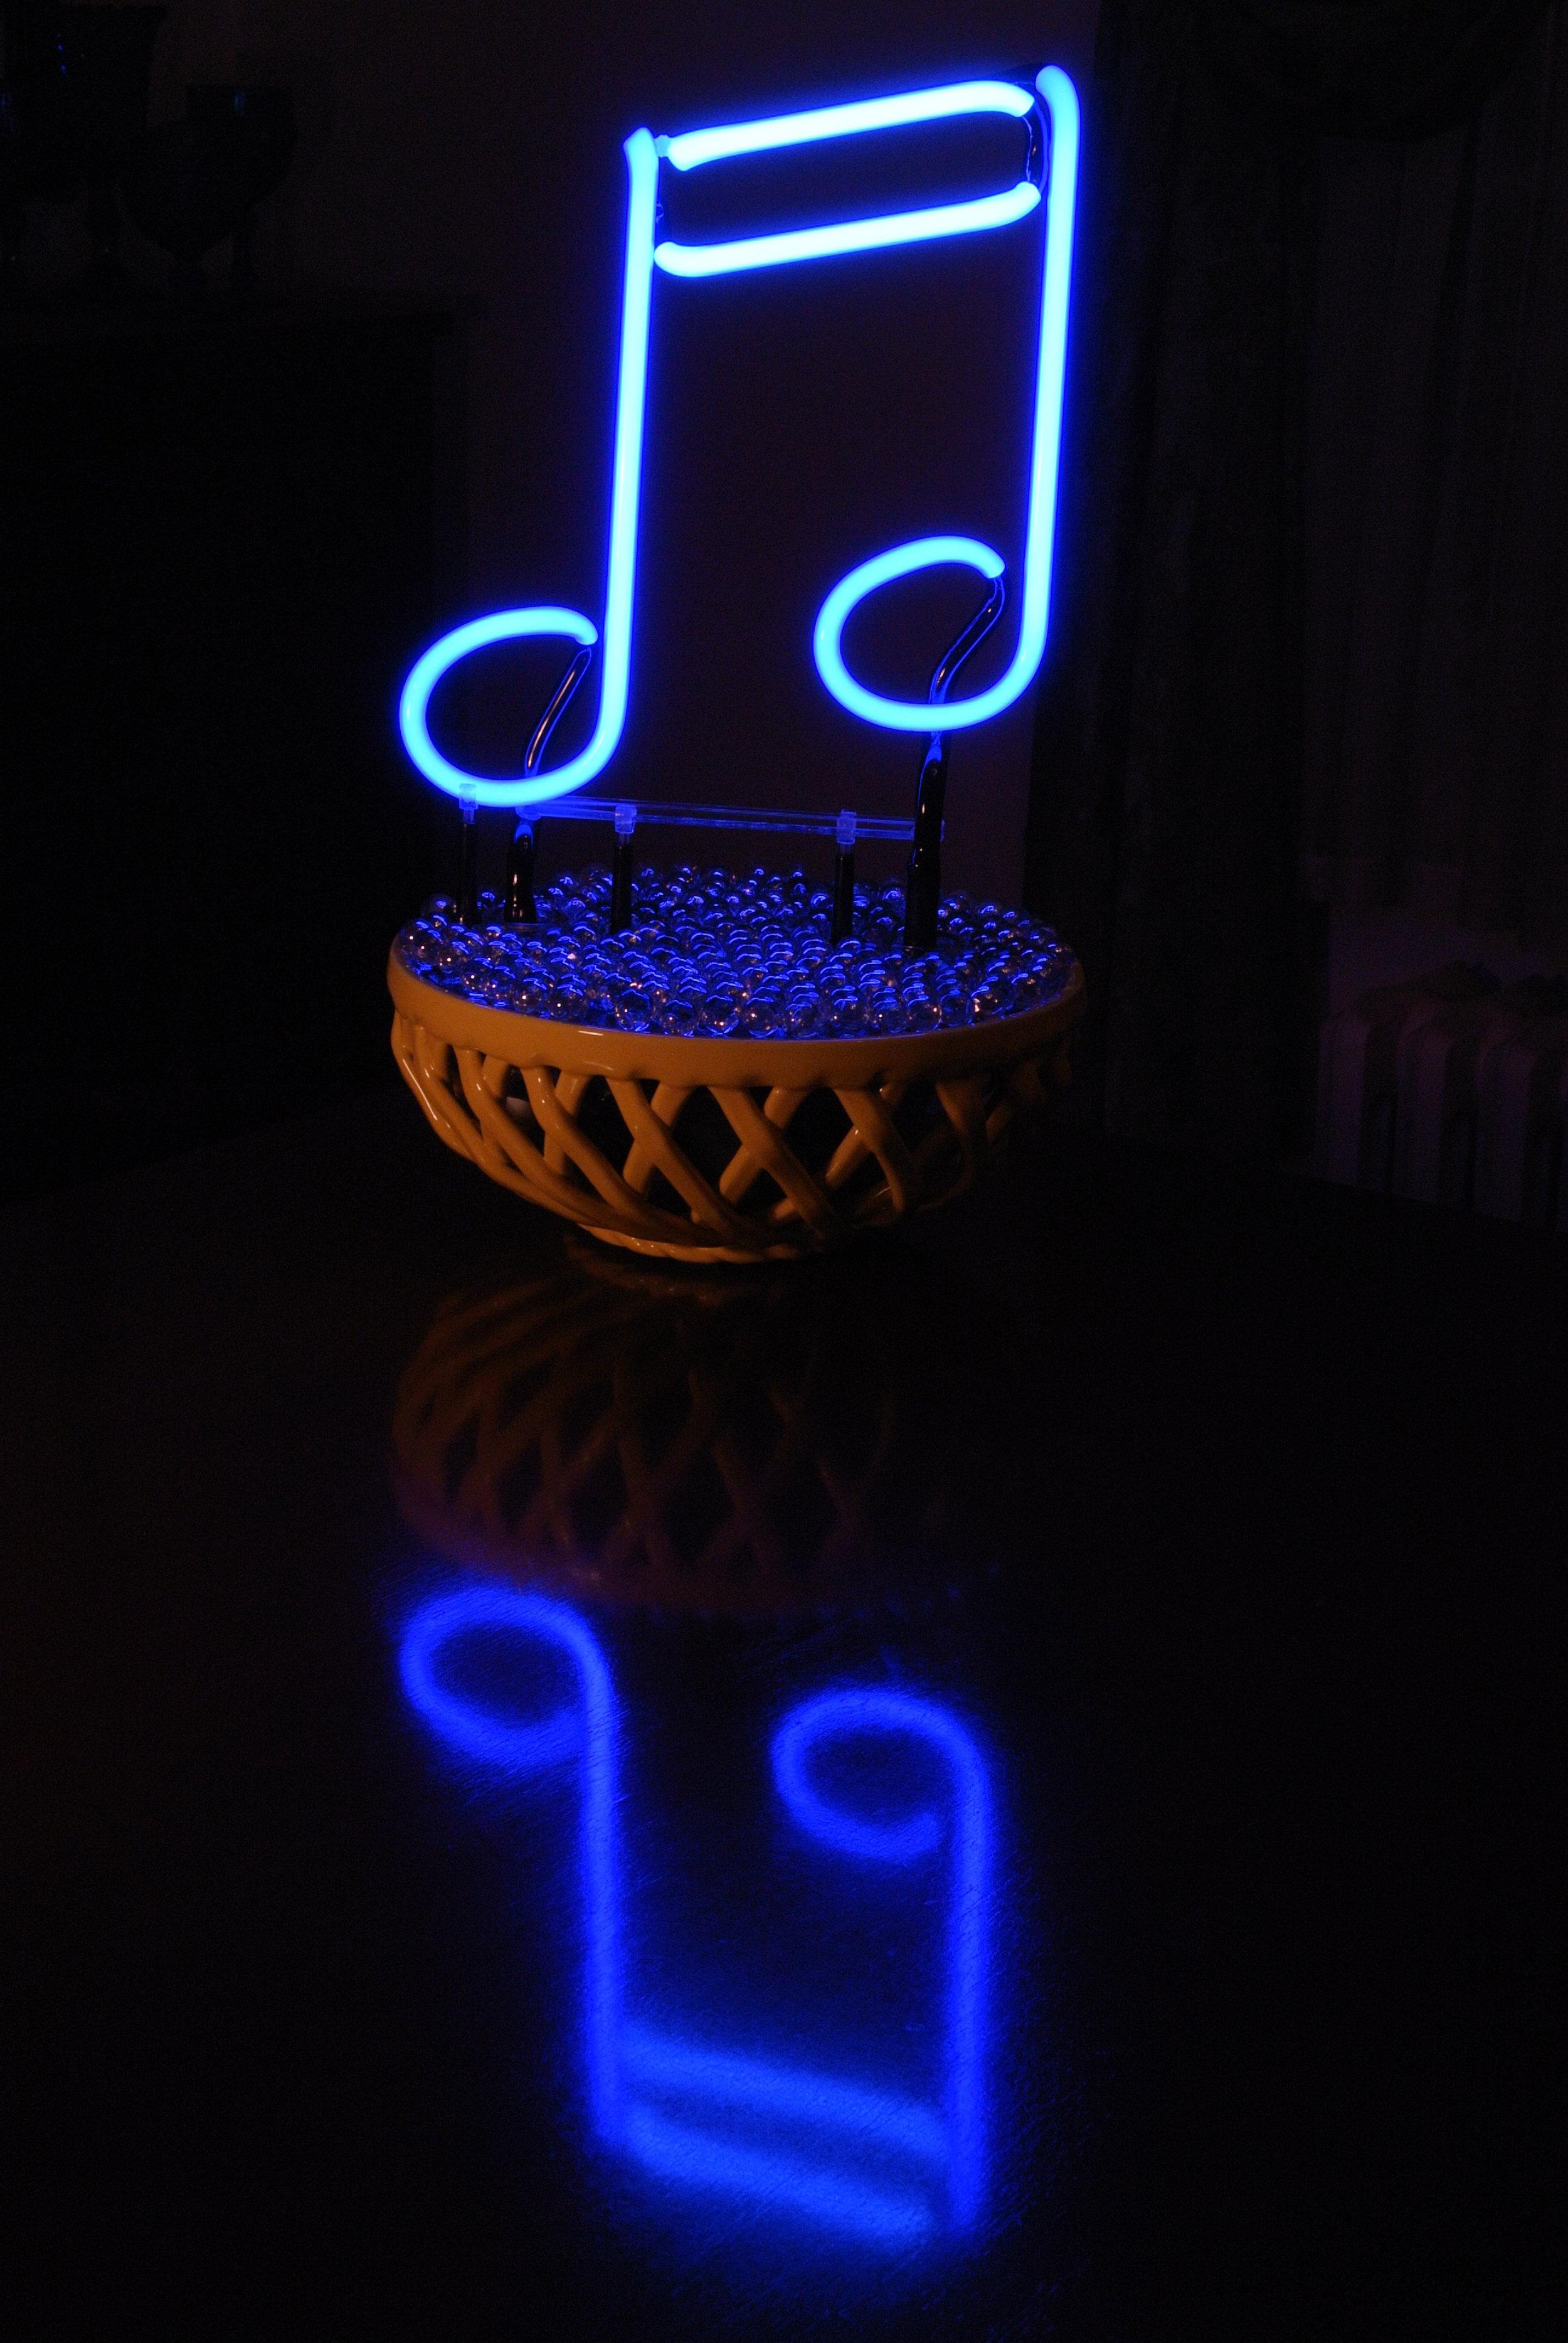 """BLUE NOTES"" Neon Light Sculpture by John Barton - BartonNeonMagic.com"